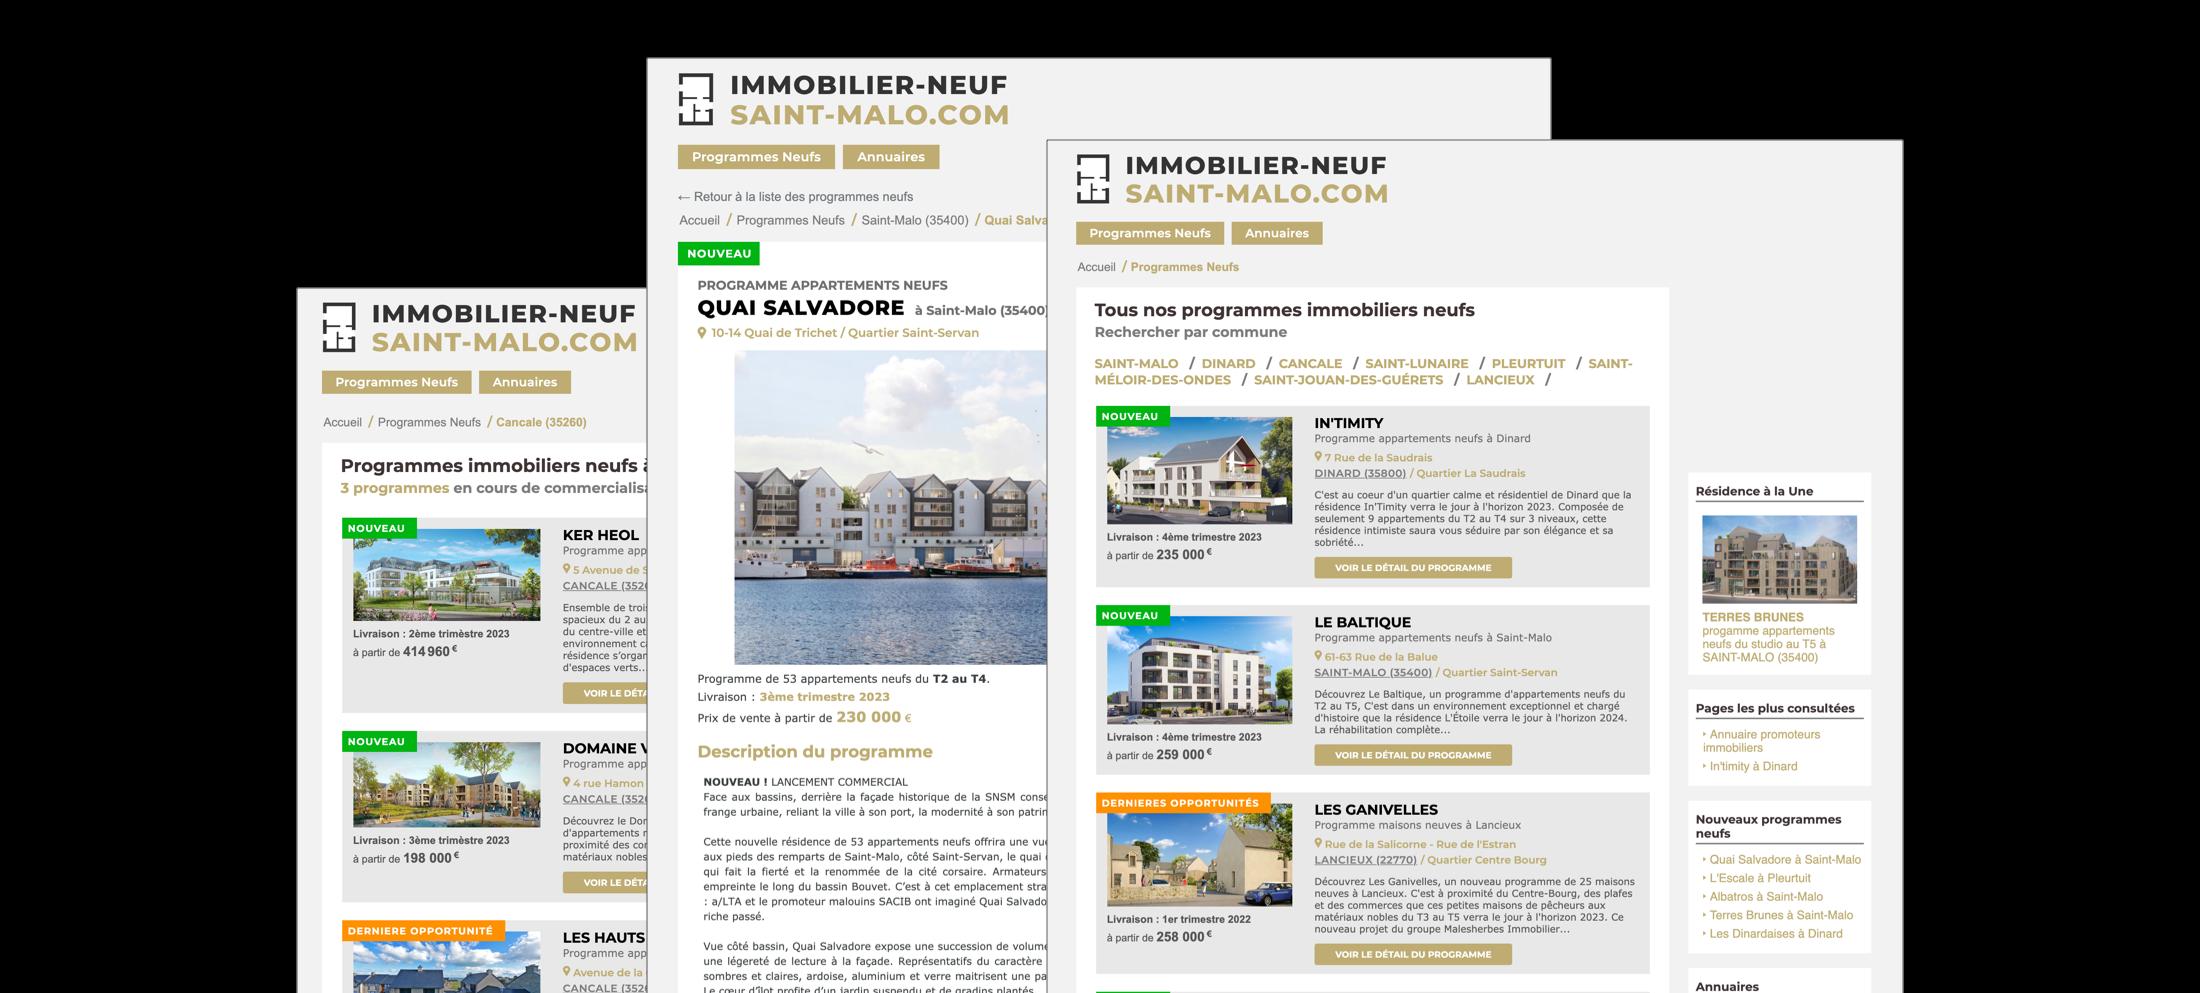 Qui sommes nous - Immobilier Neuf Saint-Malo